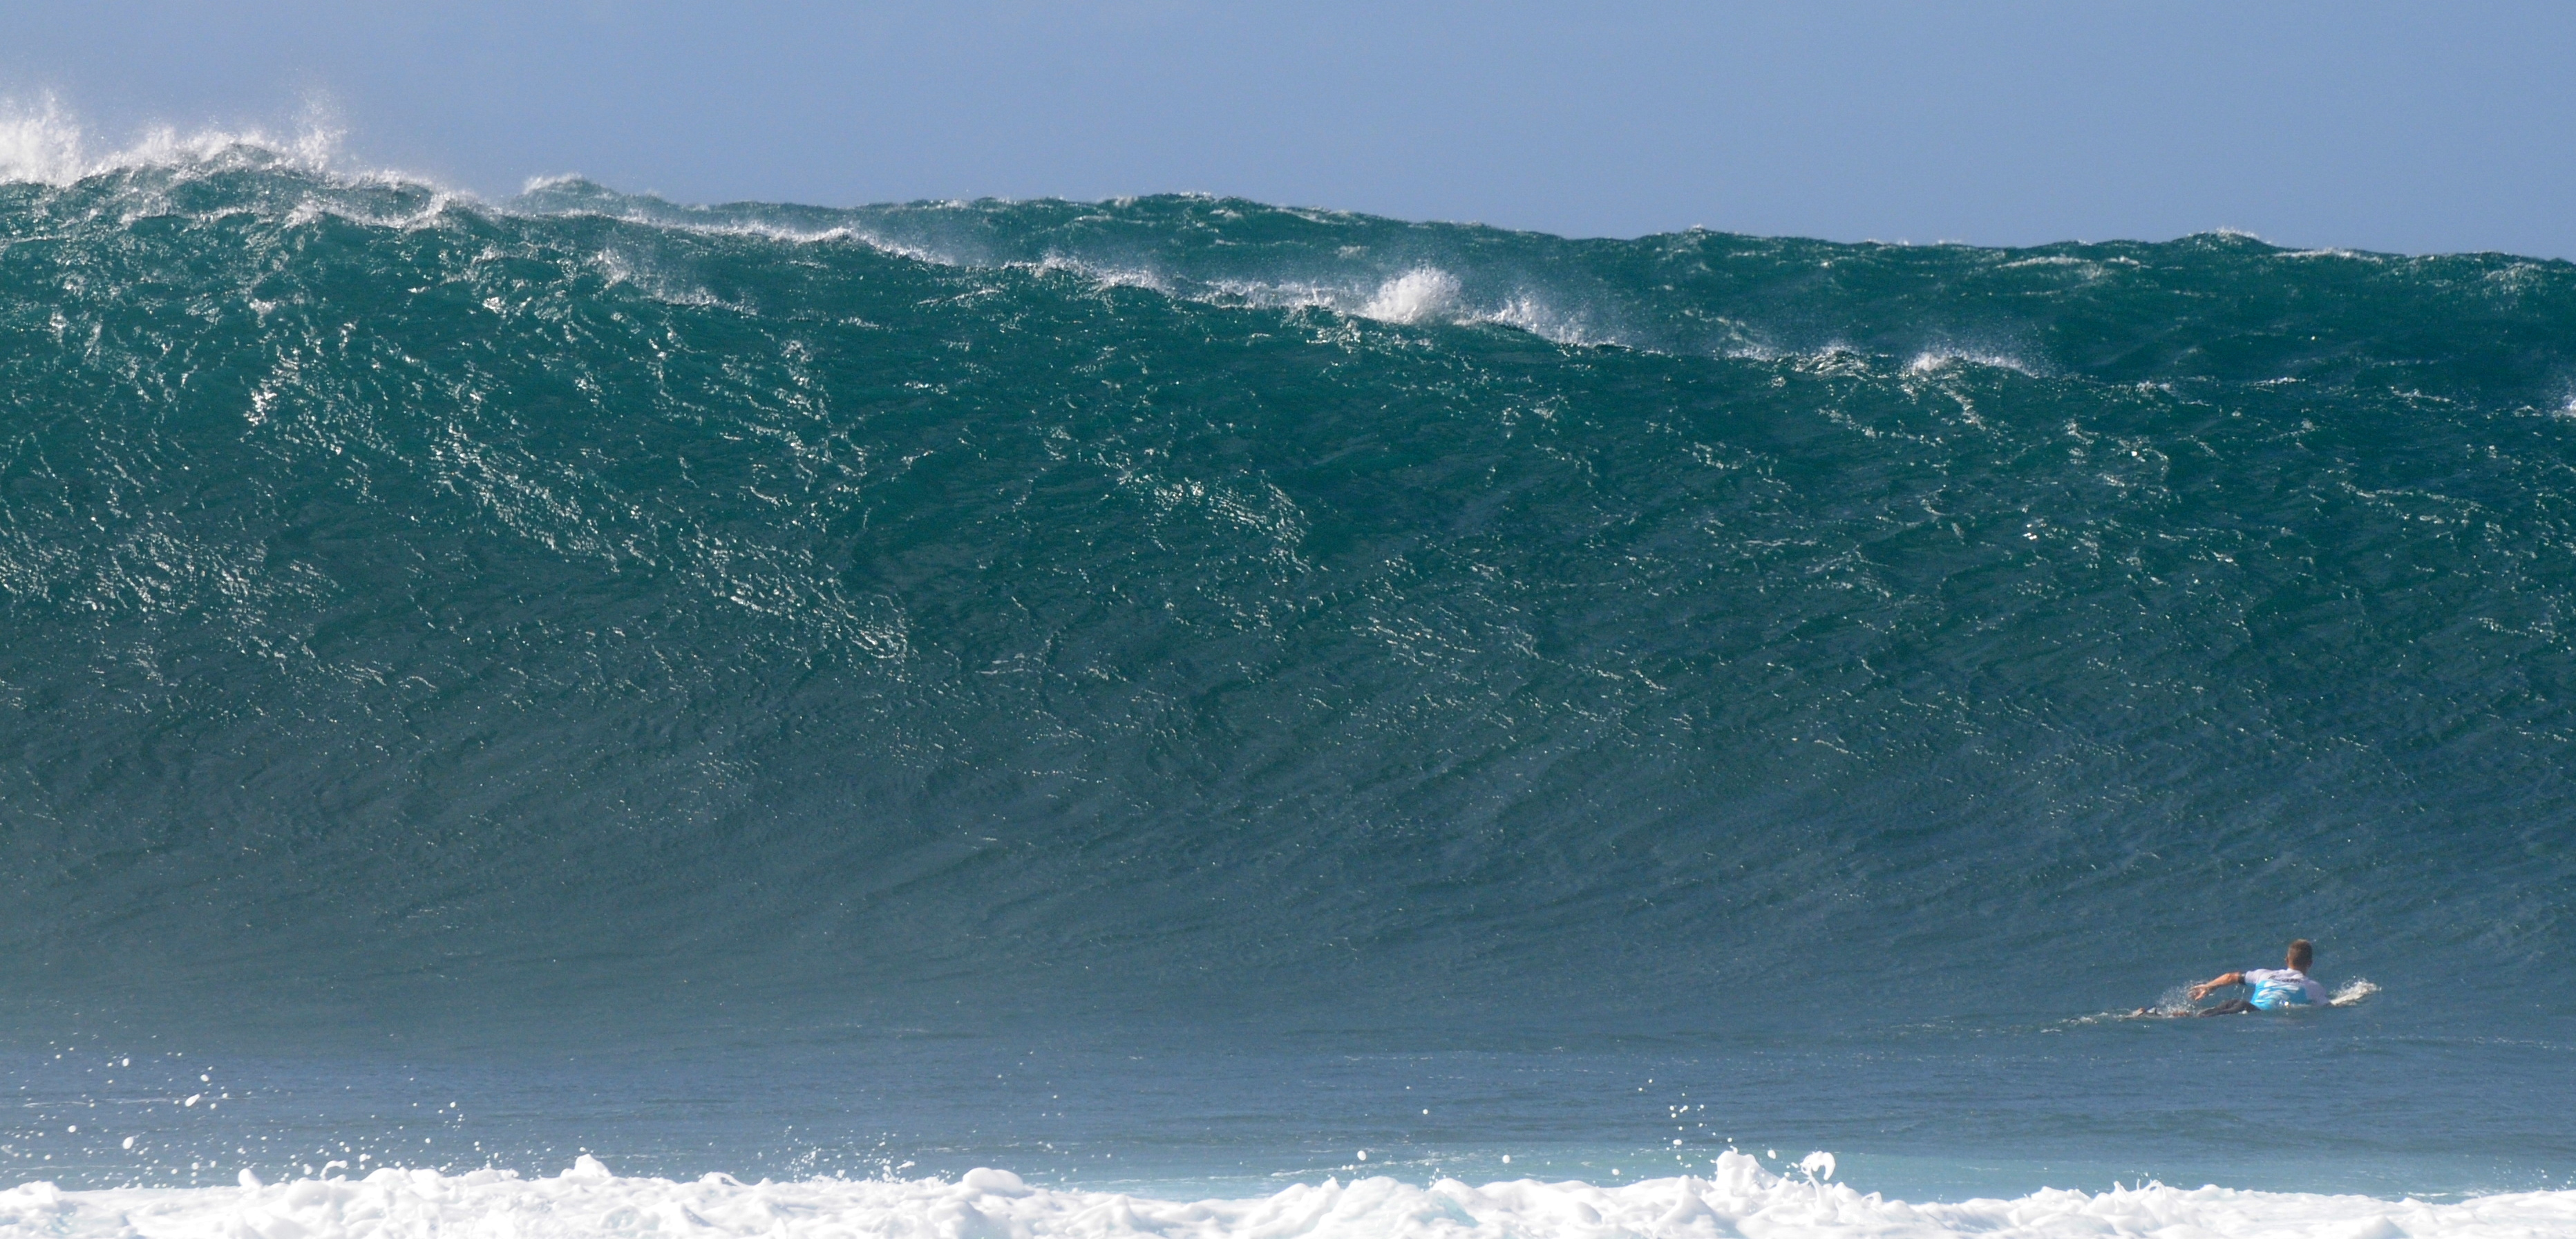 Un méchant Set arrive - 1er Tour 08-12-2011 Billabong PIPE Masters © Maxim Mladenov, Hawaii